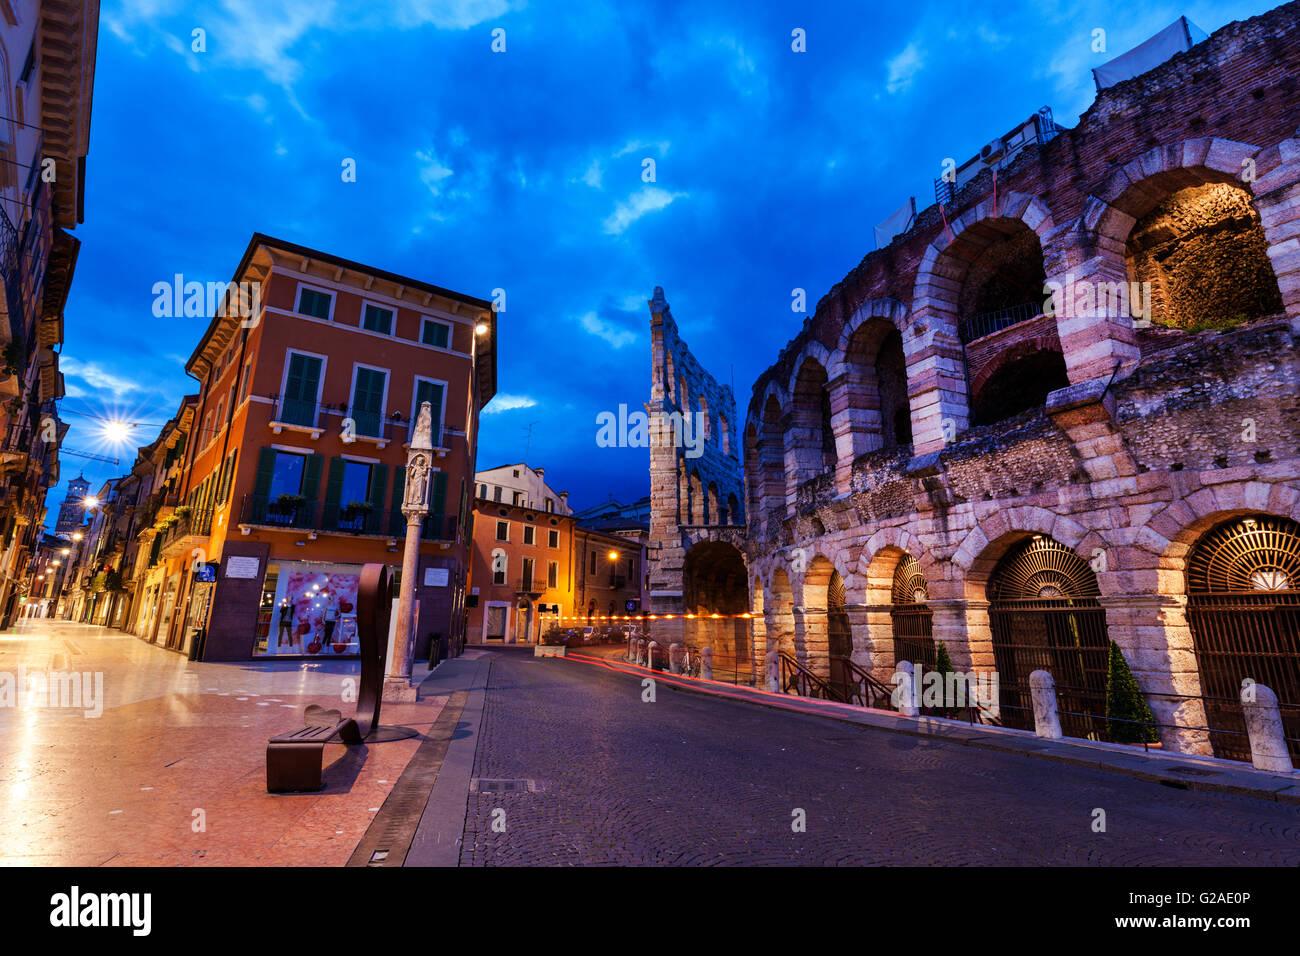 The Verona Arena on Piazza Bra in Verona Verona, Veneto, Italy Stock Photo